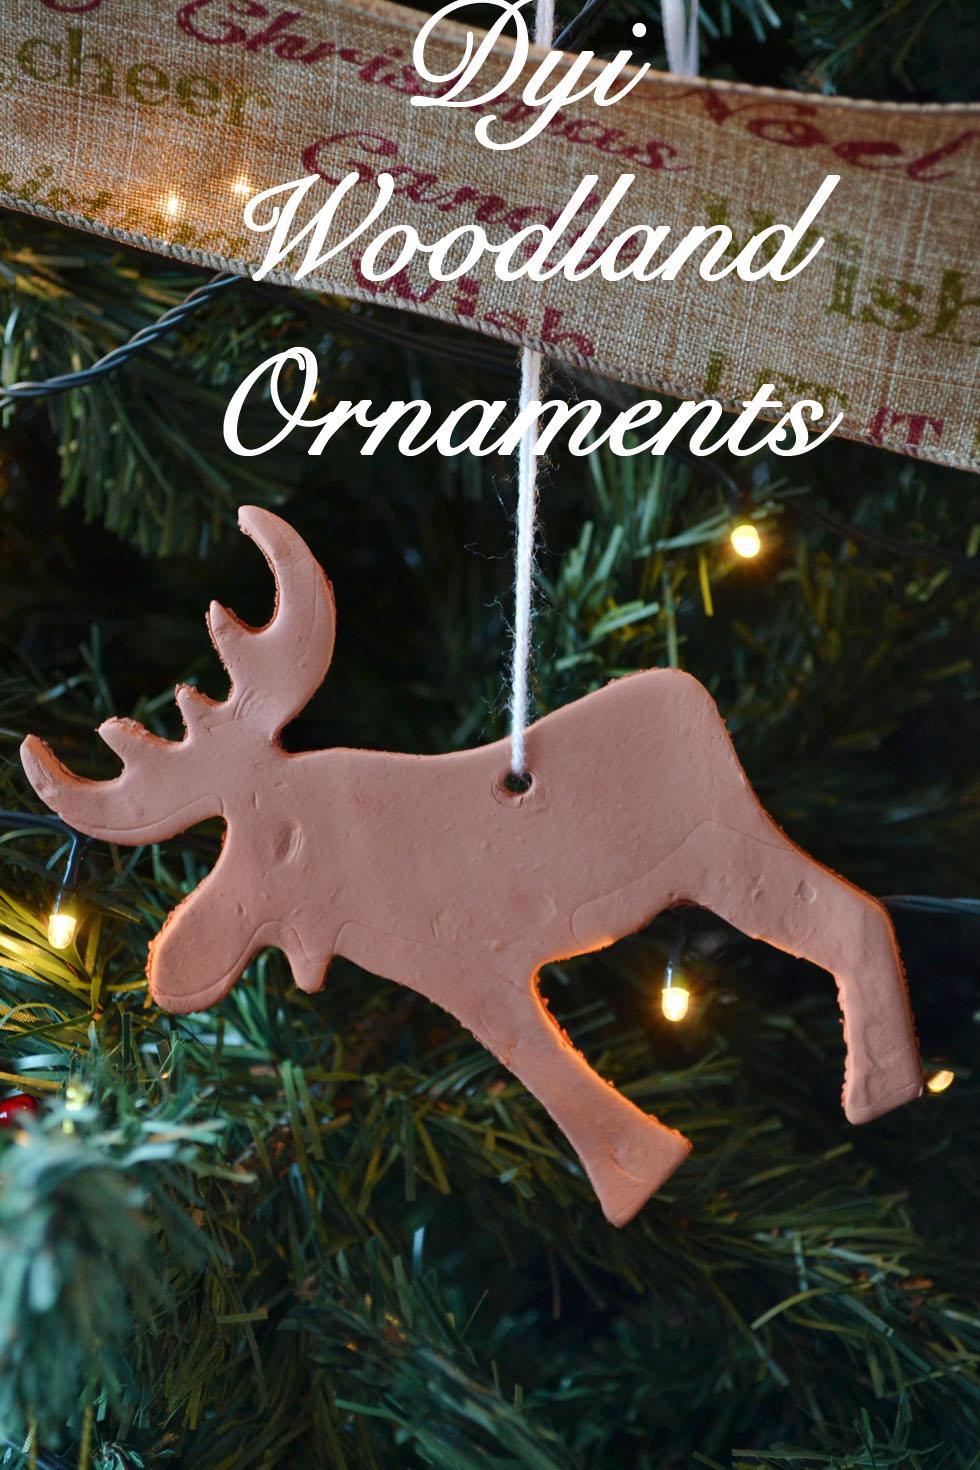 diy woodland ornaments letters DSC_0015